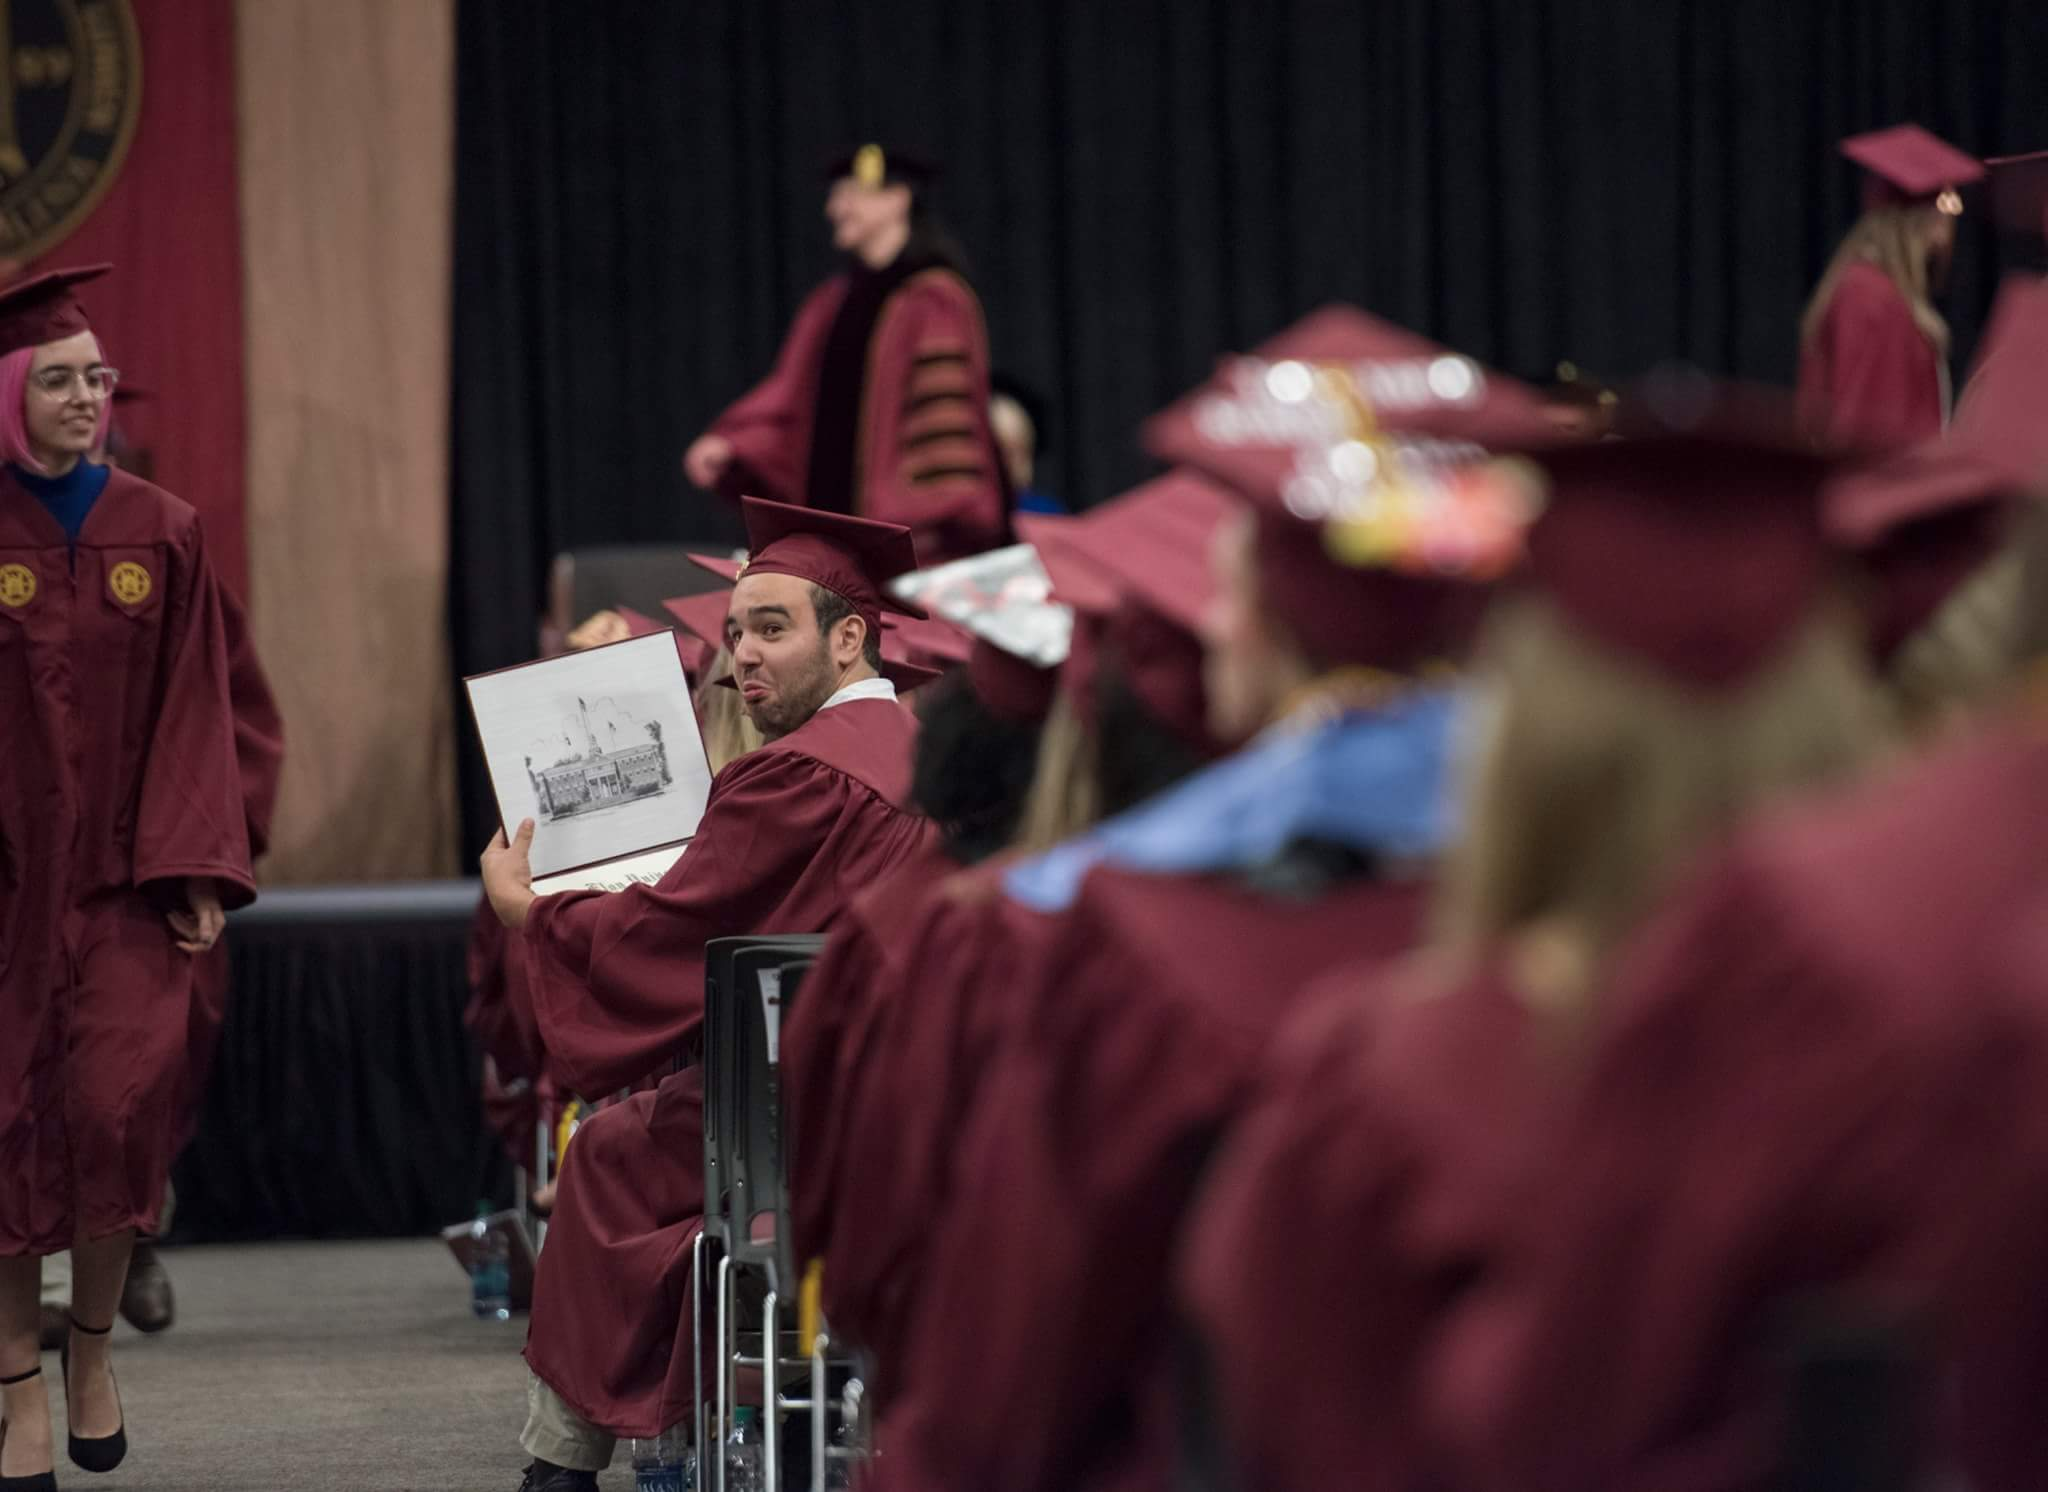 Jasper Gradutaion Looking Backwards.jpg